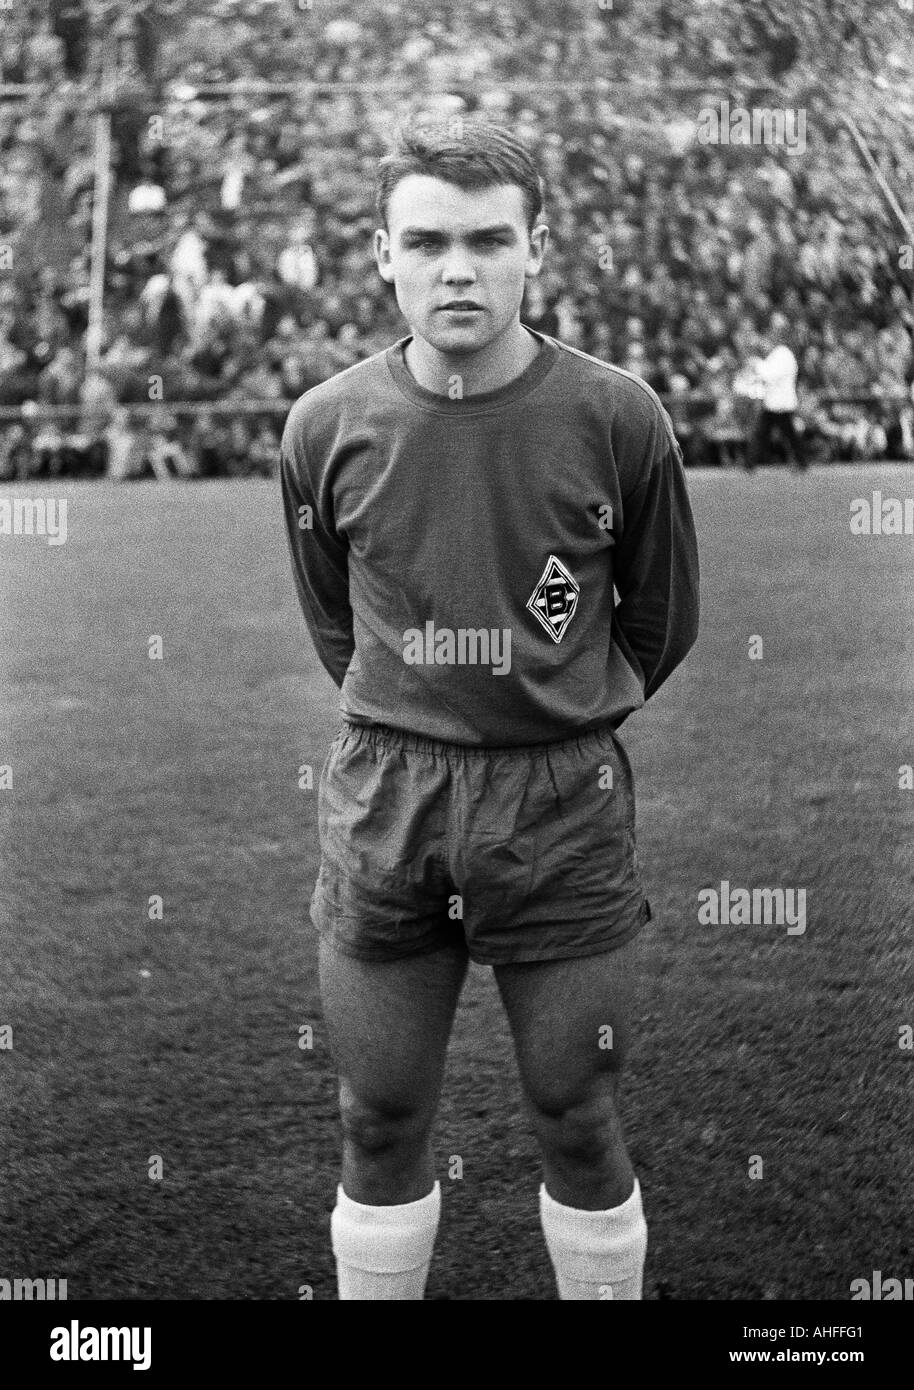 football, Bundesliga, 1965/1966, Boekelberg Stadium, Borussia Moenchengladbach versus Borussia Dortmund 4:5, football player, portrait of Herbert Laumen (Gladbach) - Stock Image